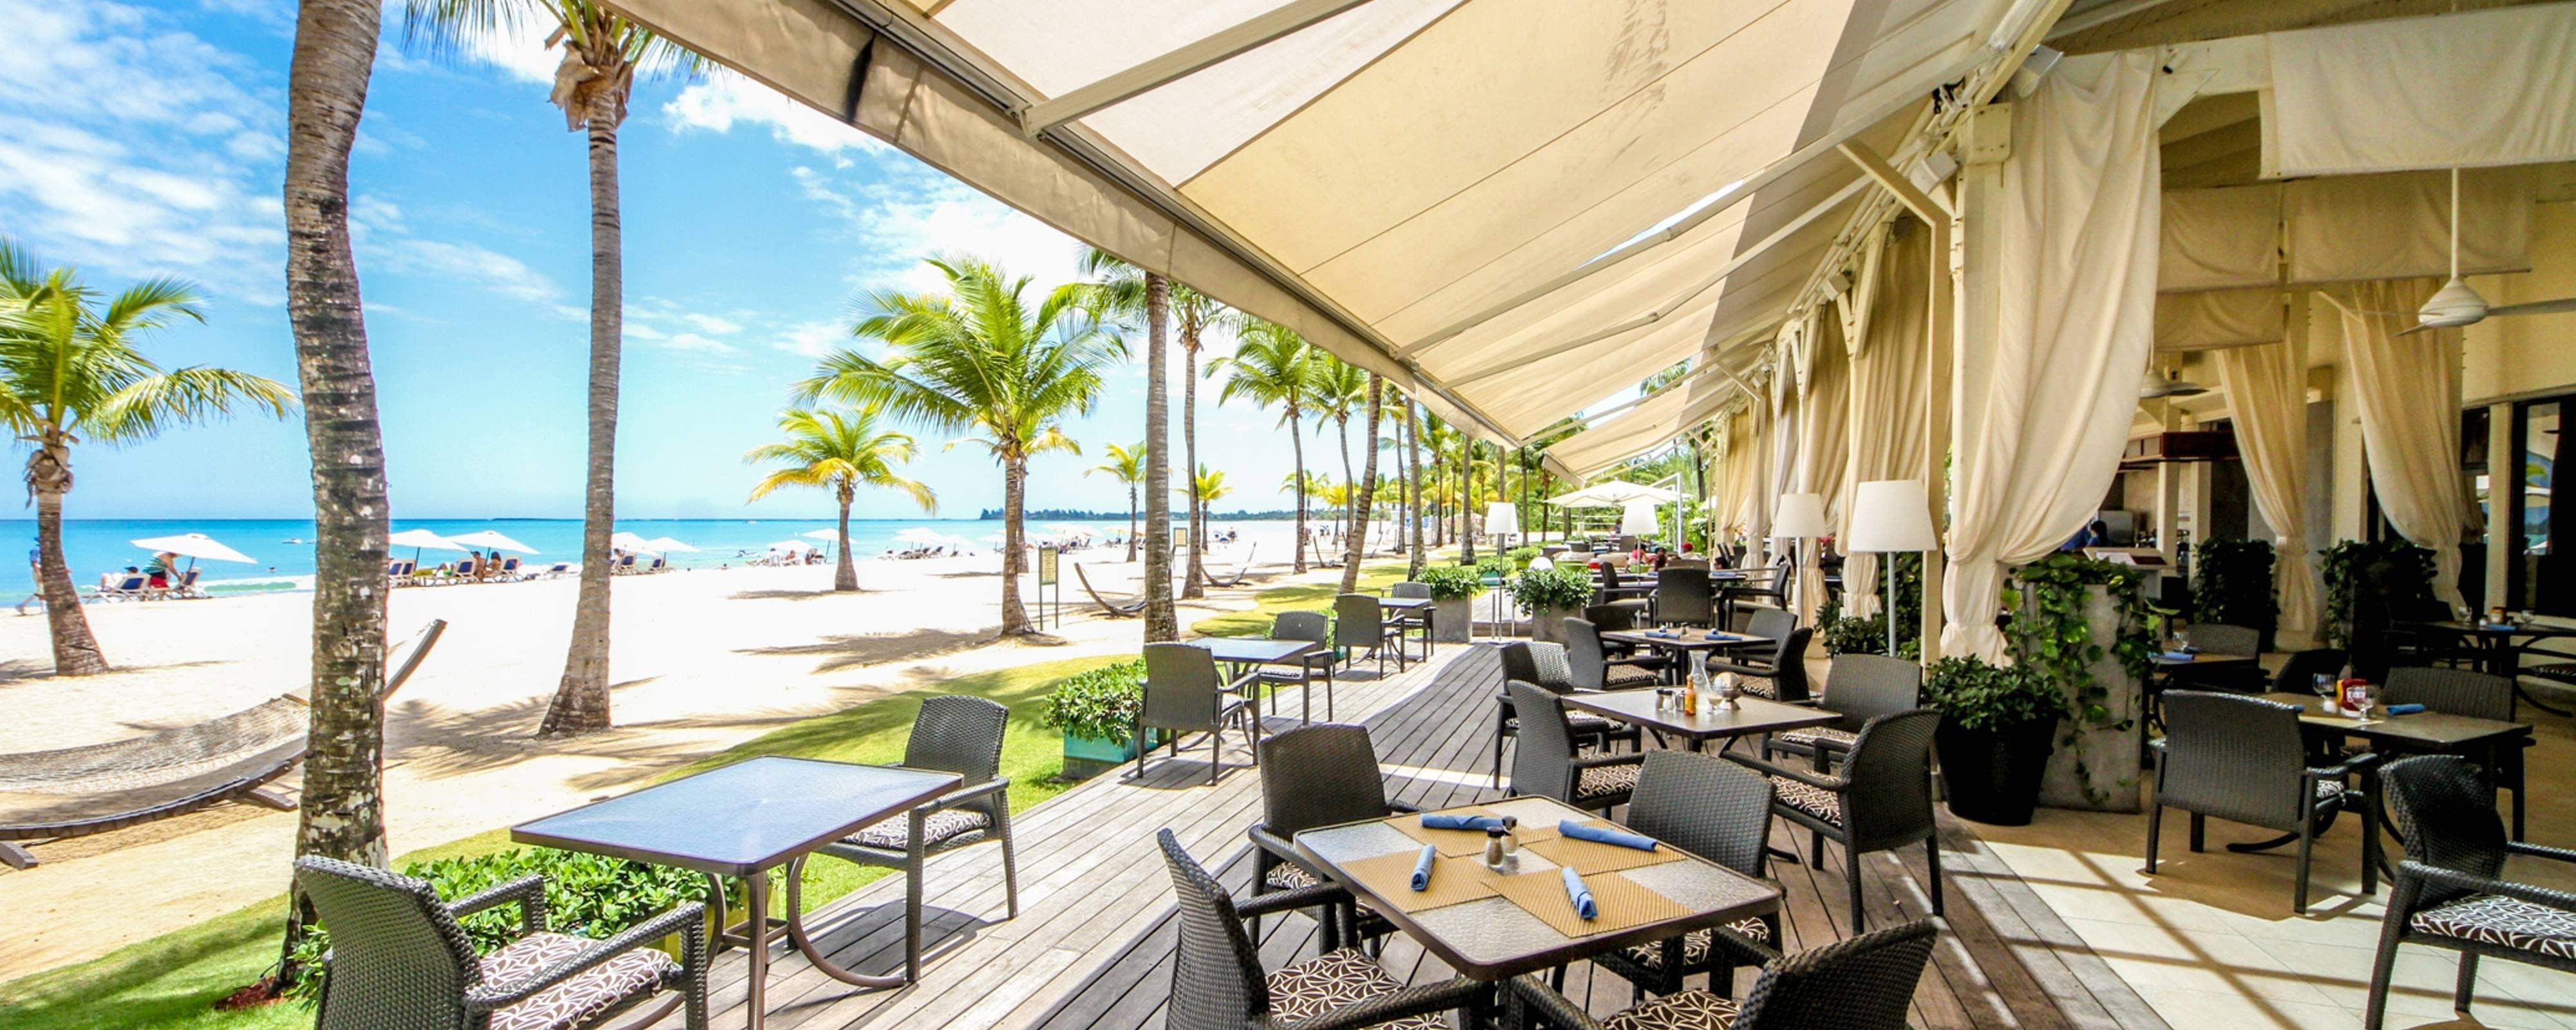 Isla Verde Puerto Rico Seafood Restaurant  Courtyard Isla Verde Beach Resort